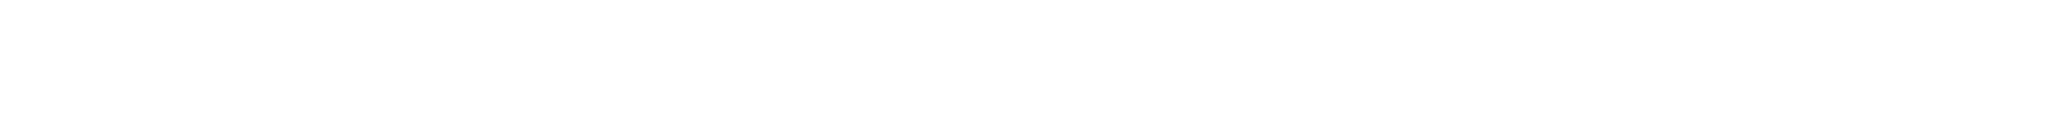 Historic Environment Forum logo